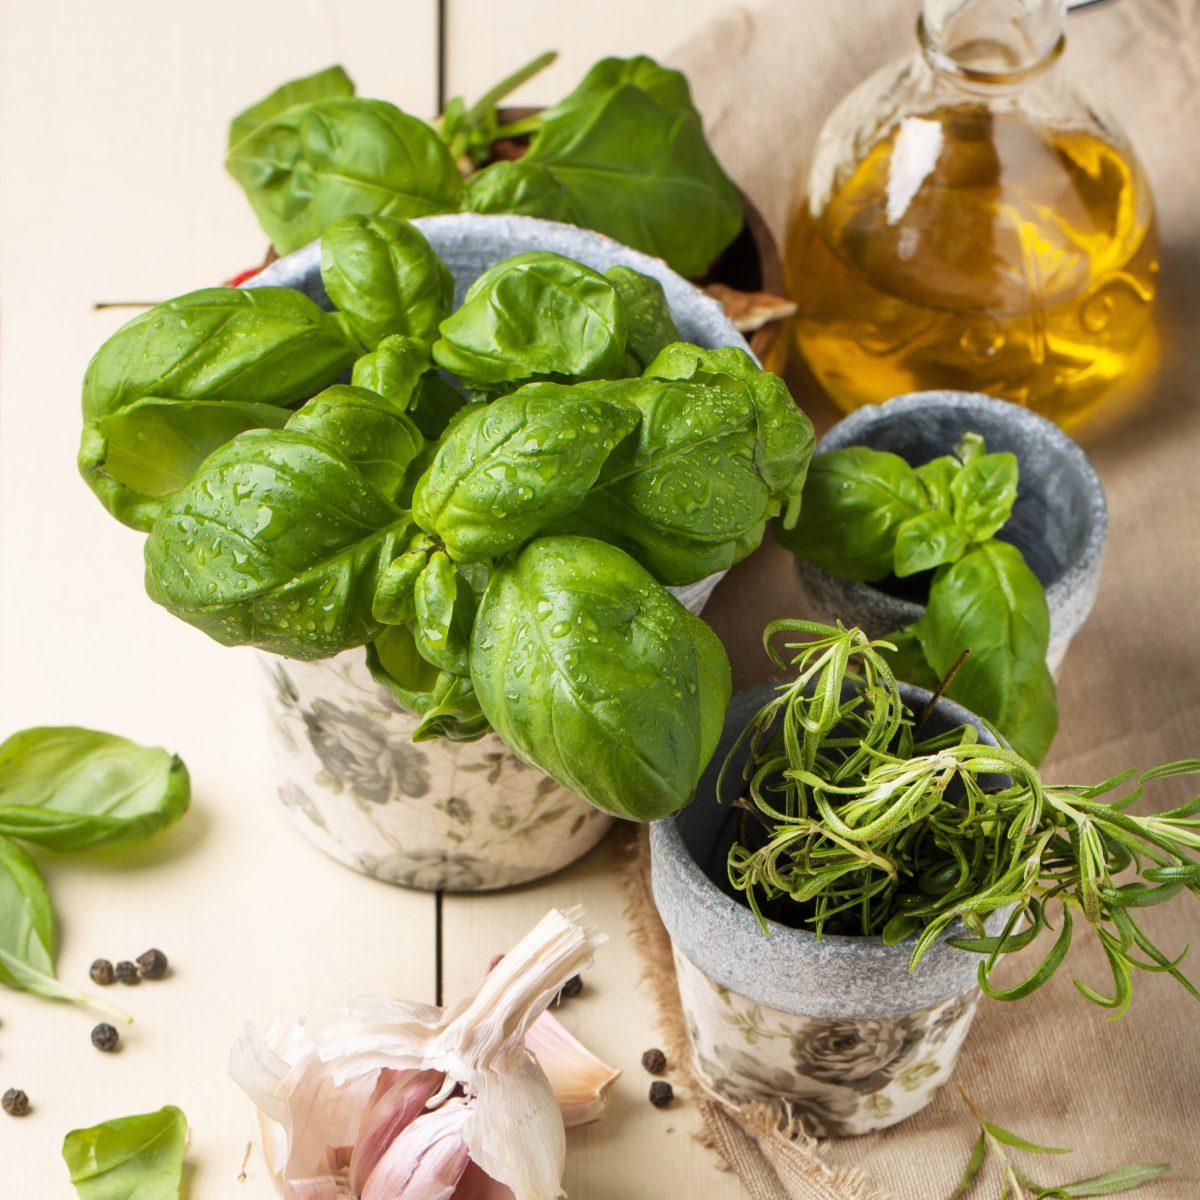 Pesto na domaći način sa mirisom Mediterana